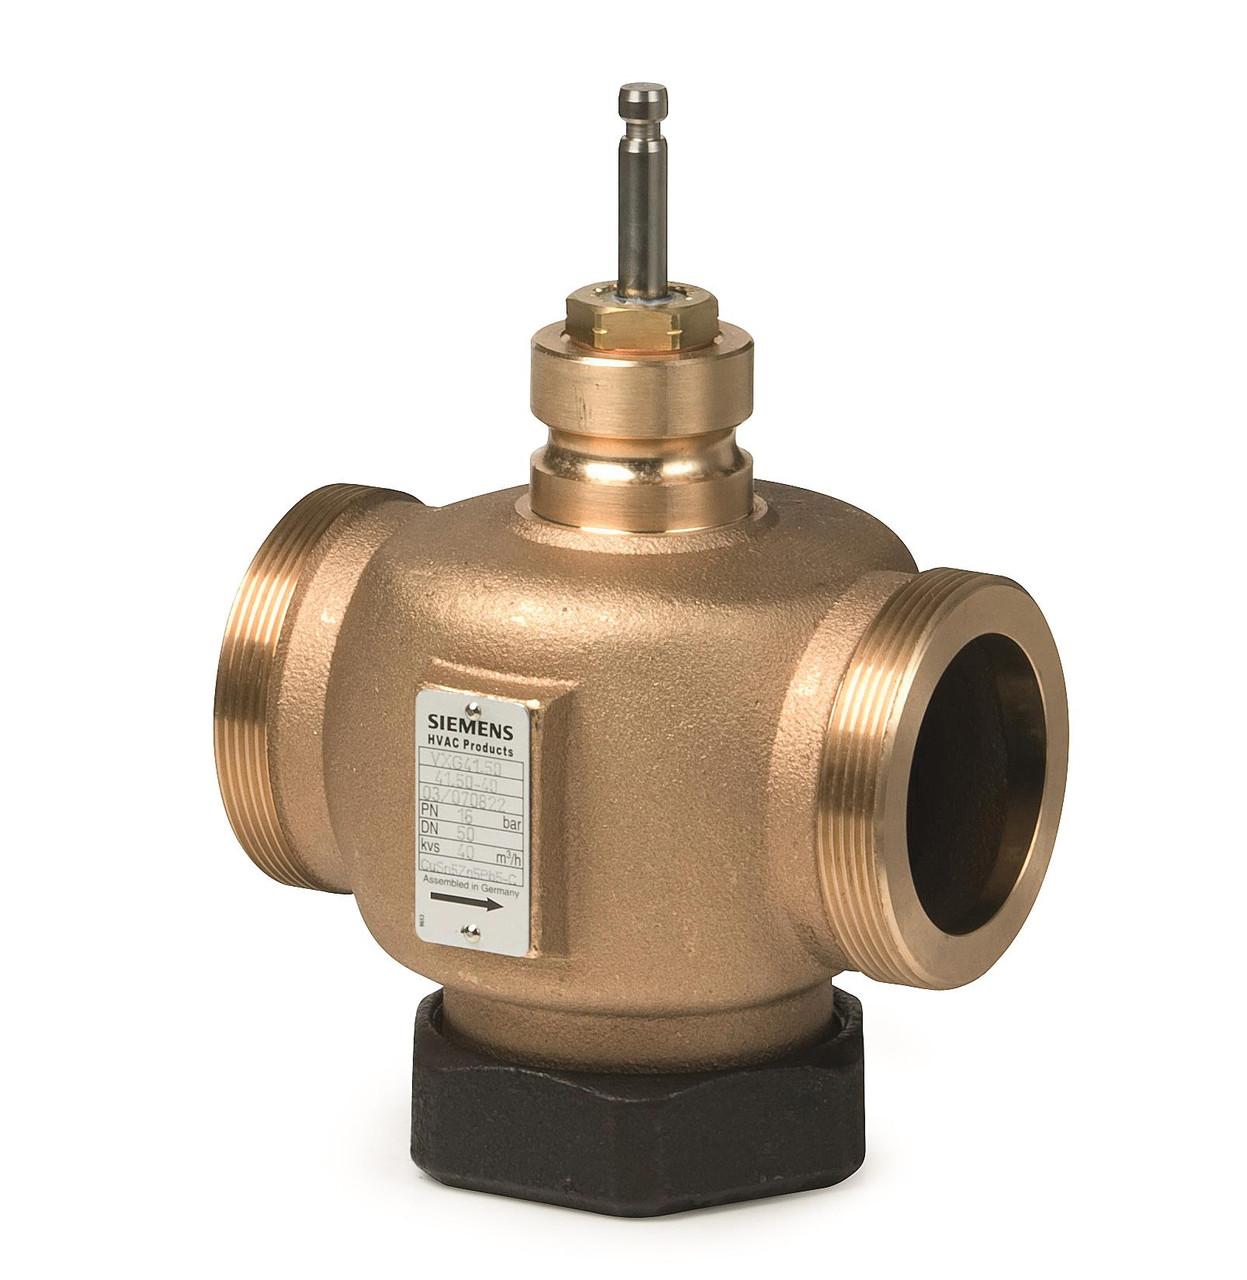 Siemens VVG41.14, 2-port seat valve, external thread, PN16, DN15, kvs 2.5